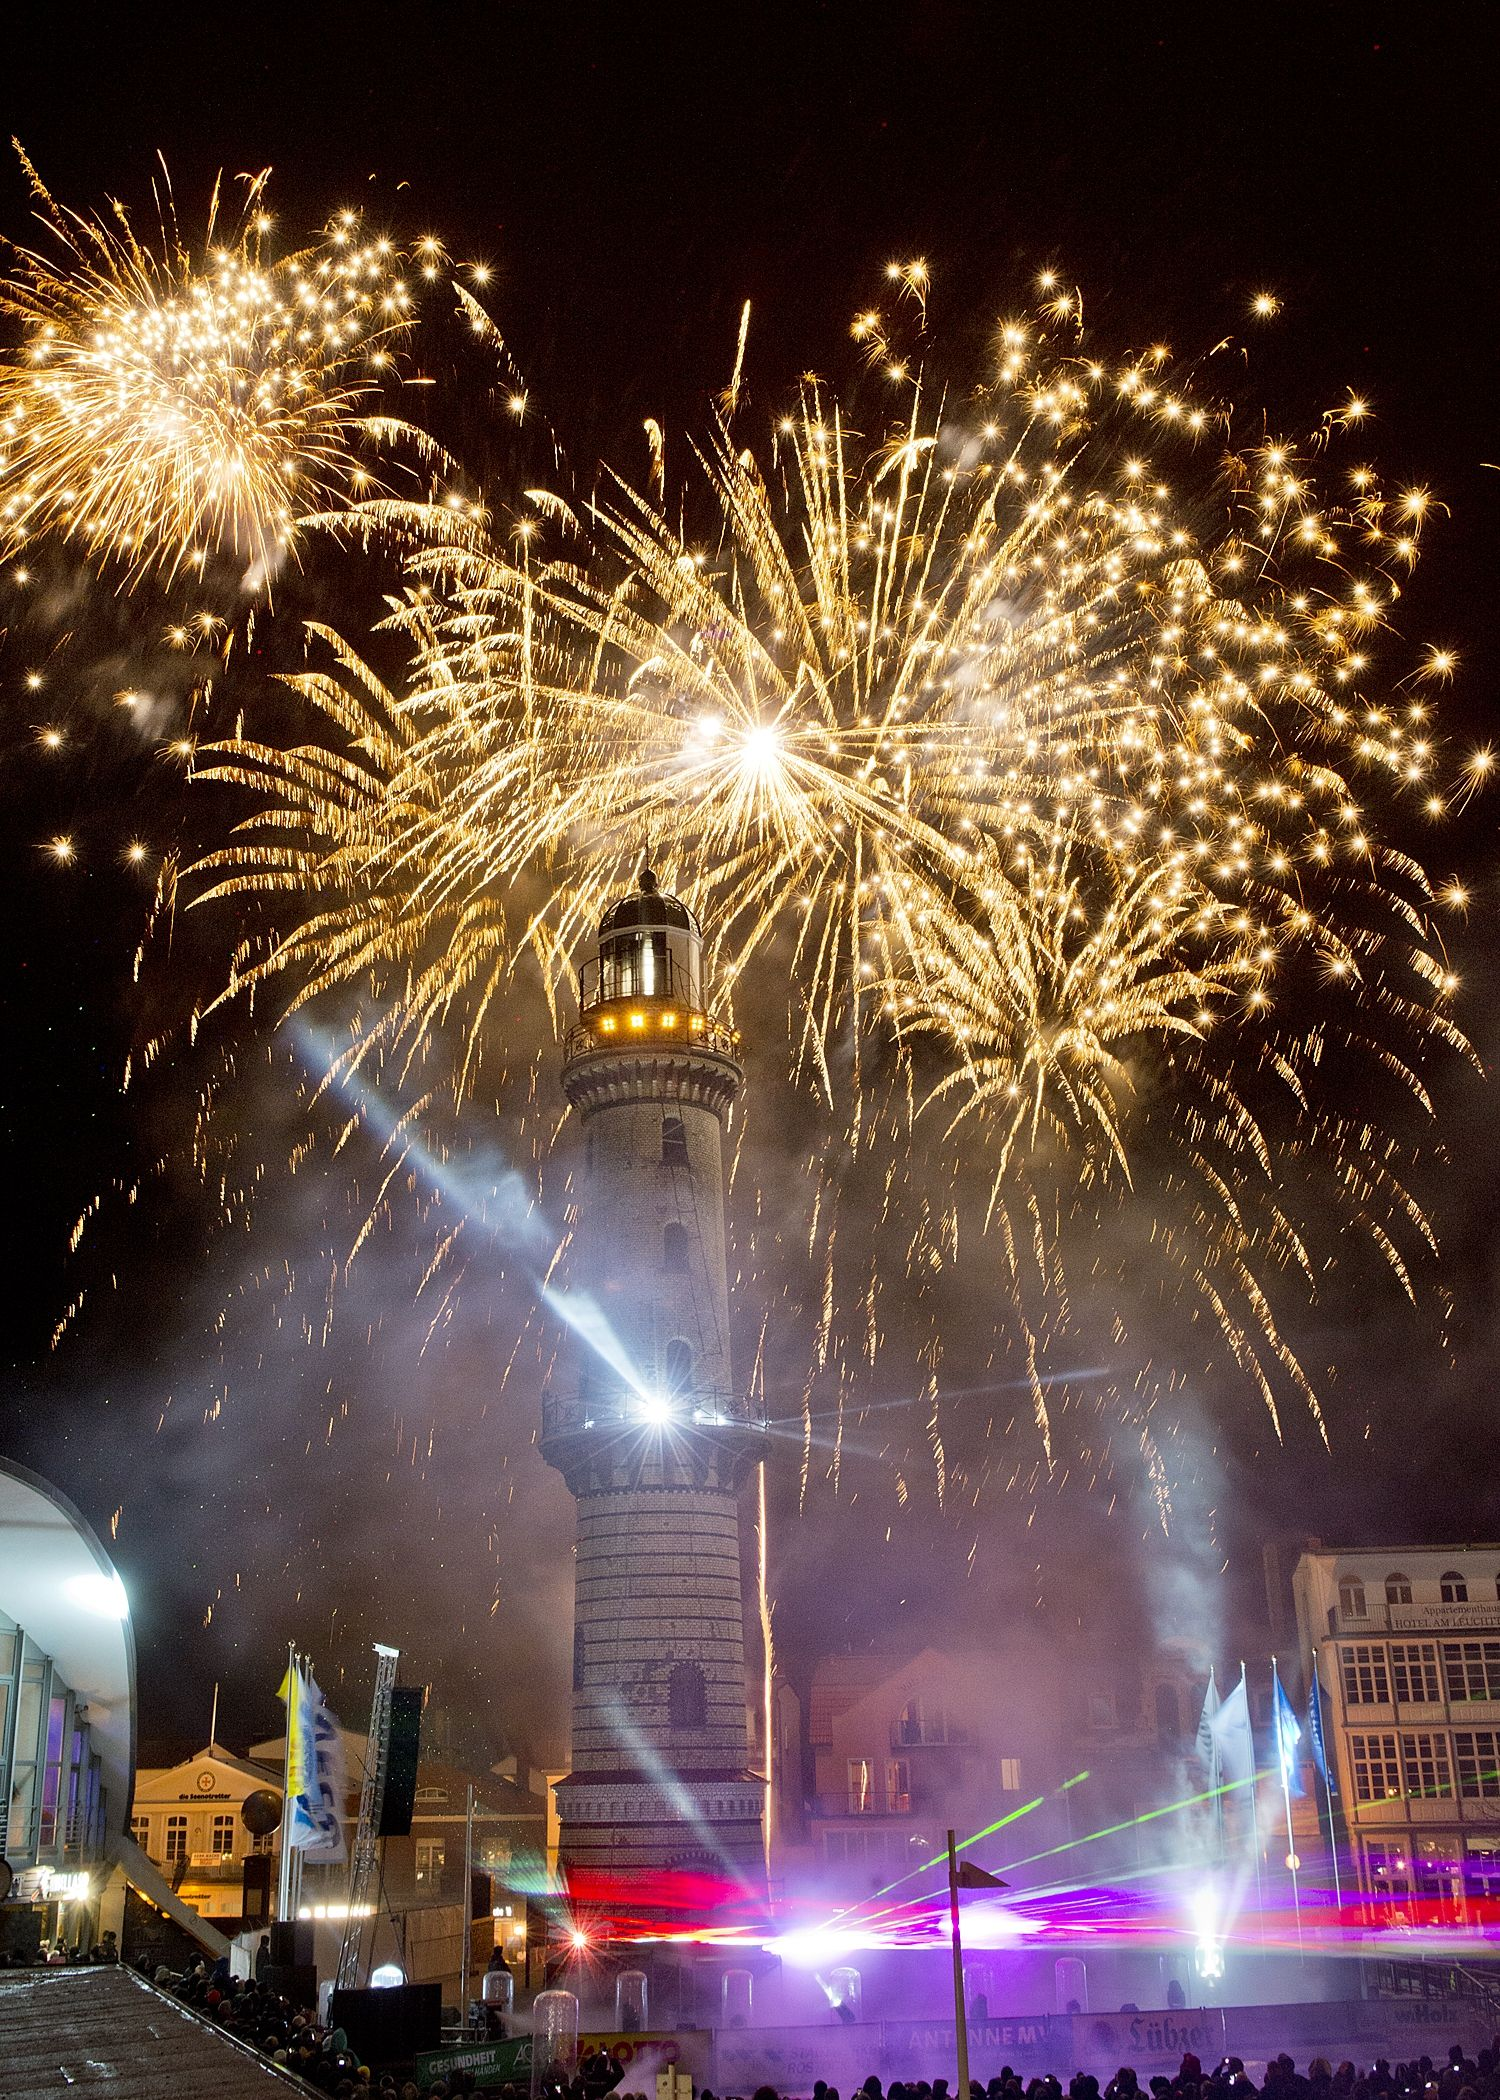 Leuchtturm In Flammen 2021